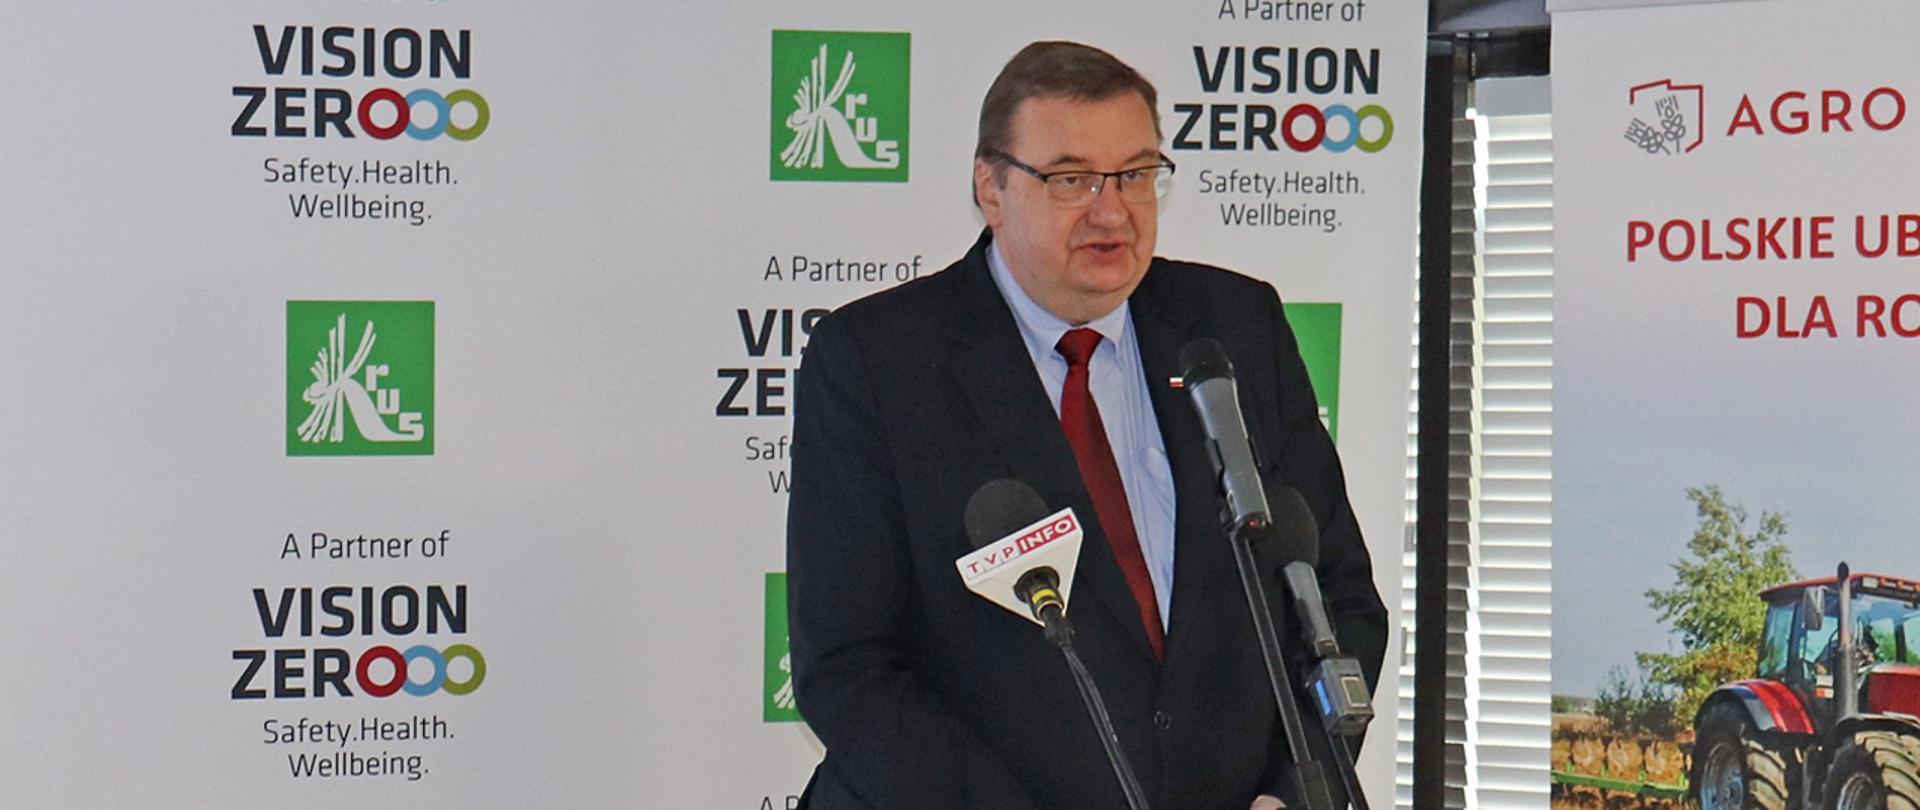 1 Vision Zero